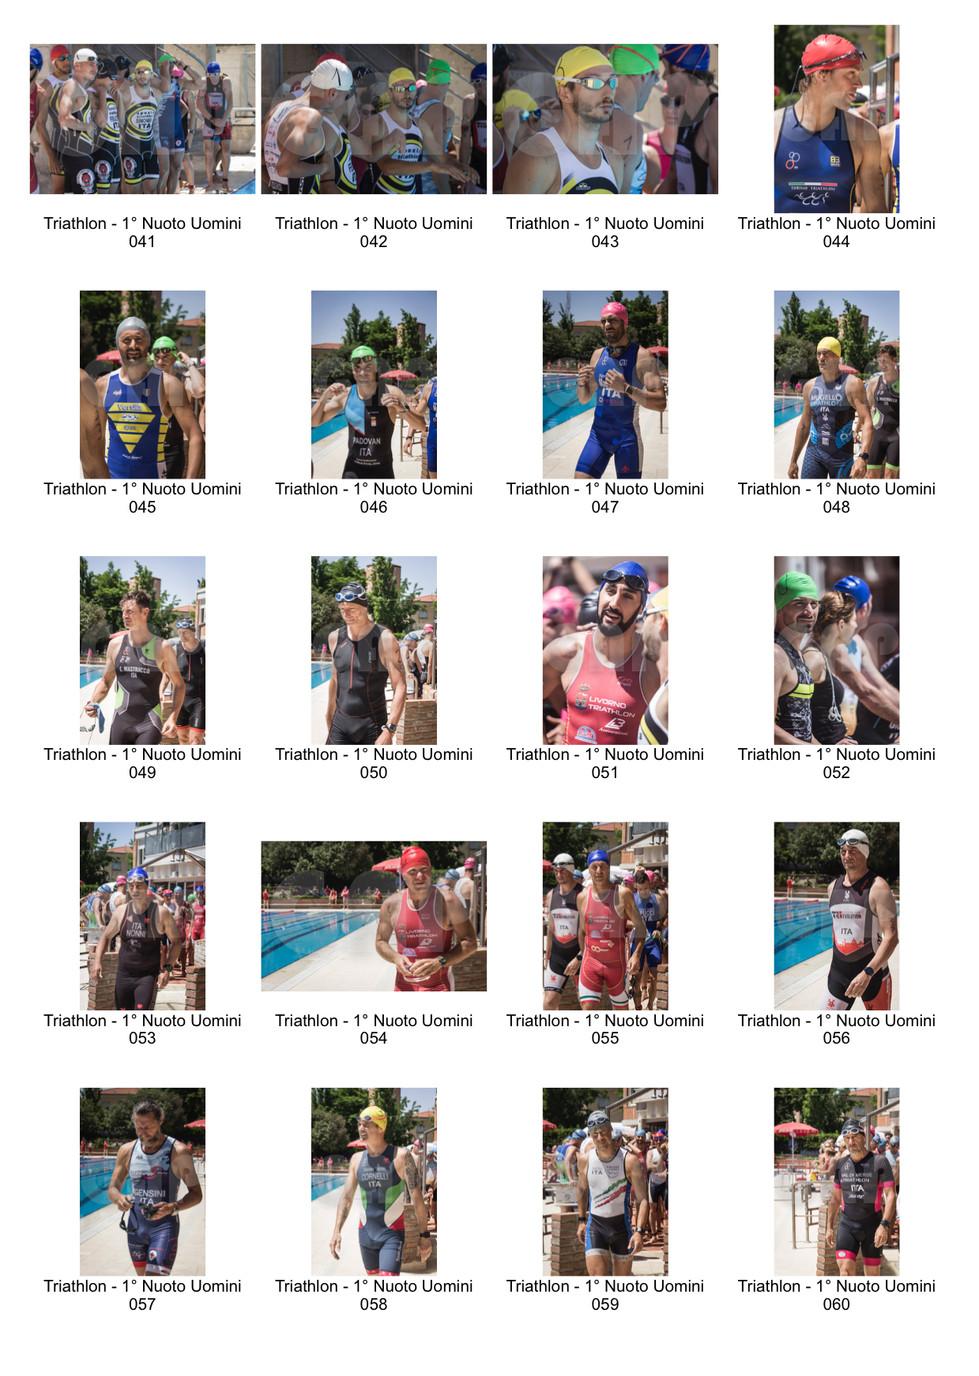 Triathlon_V.Elsa_-_1°_Frazione_Nuoto_Uomini_-03.jpg